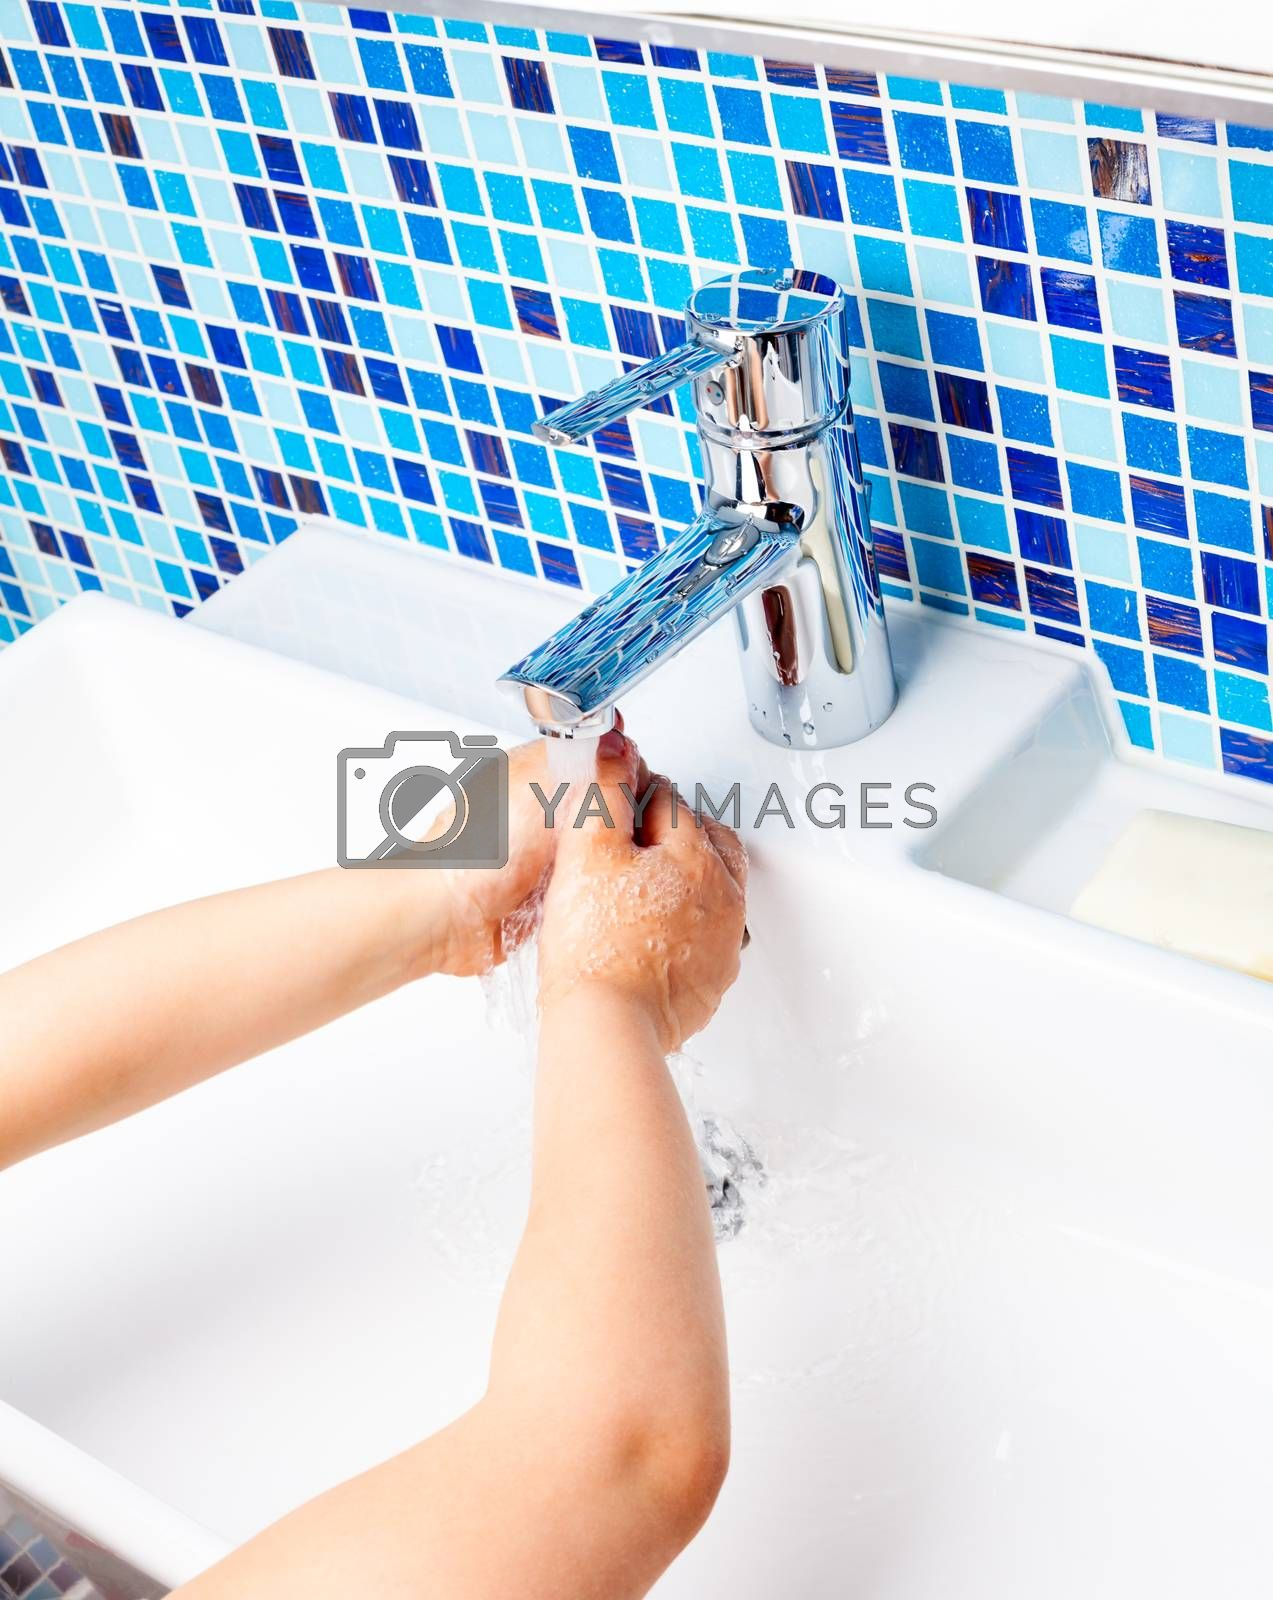 Girl washing her hands in a bathroom sink